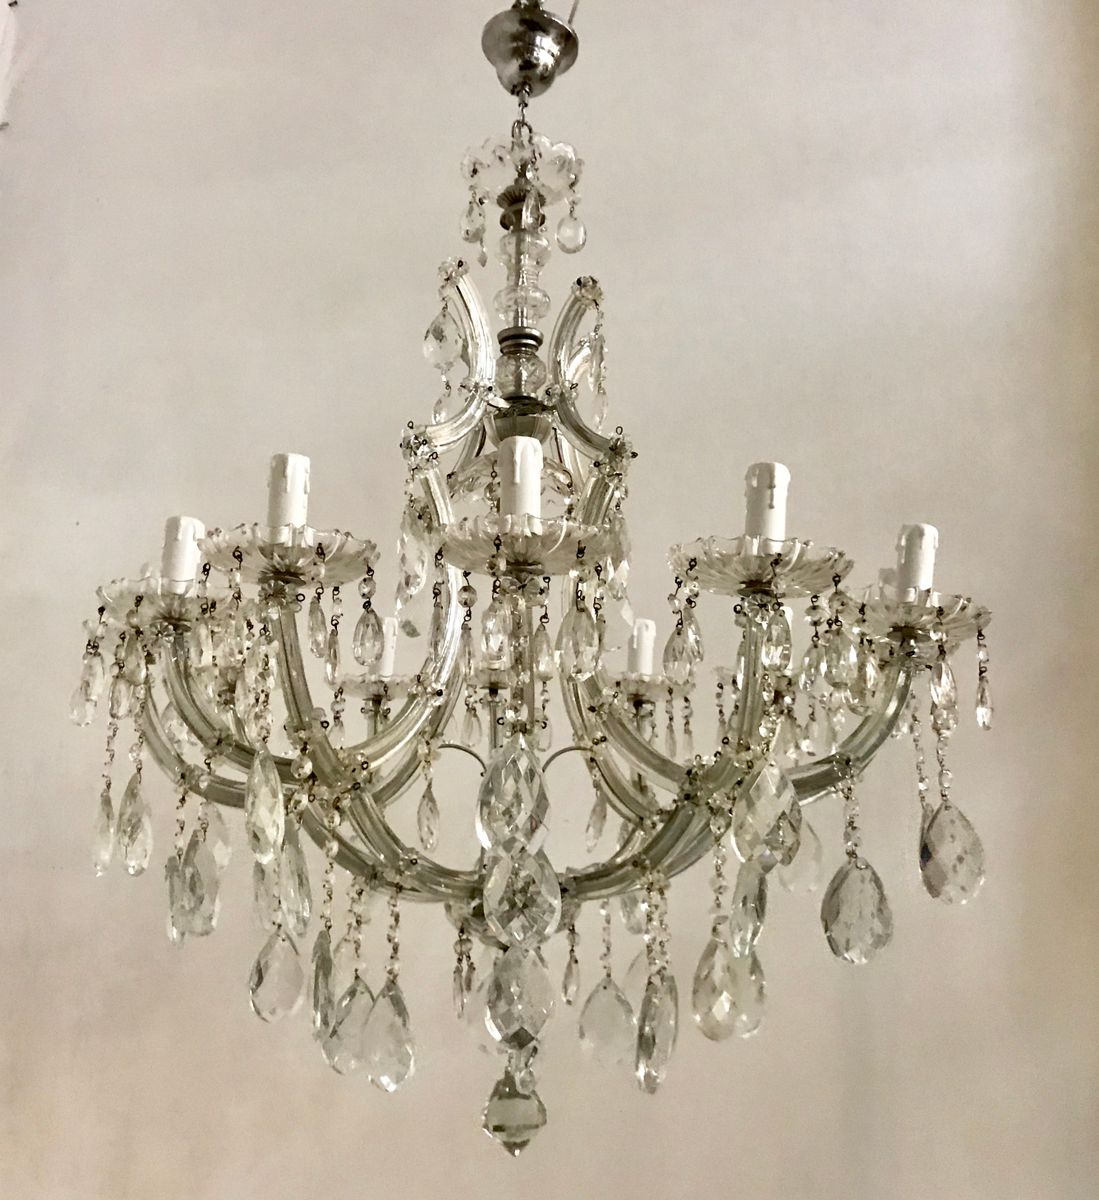 Großer Maria Theresa Kronleuchter aus Kristallglas, 1950er